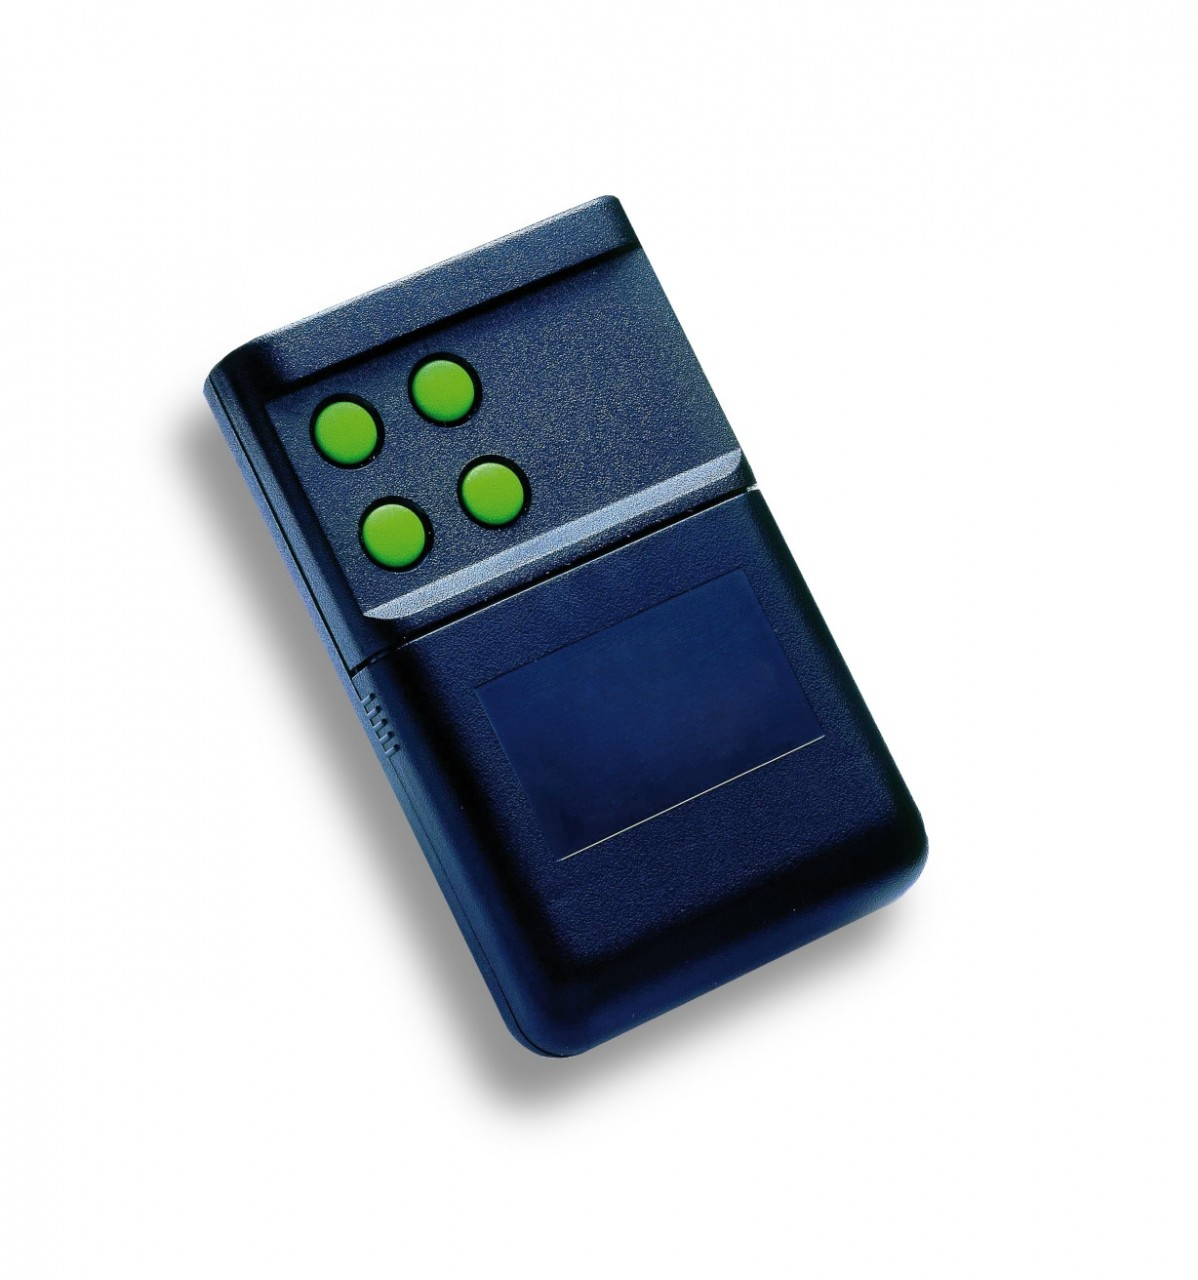 Tormatic Handsender S41-4 mit 40,685 MHz